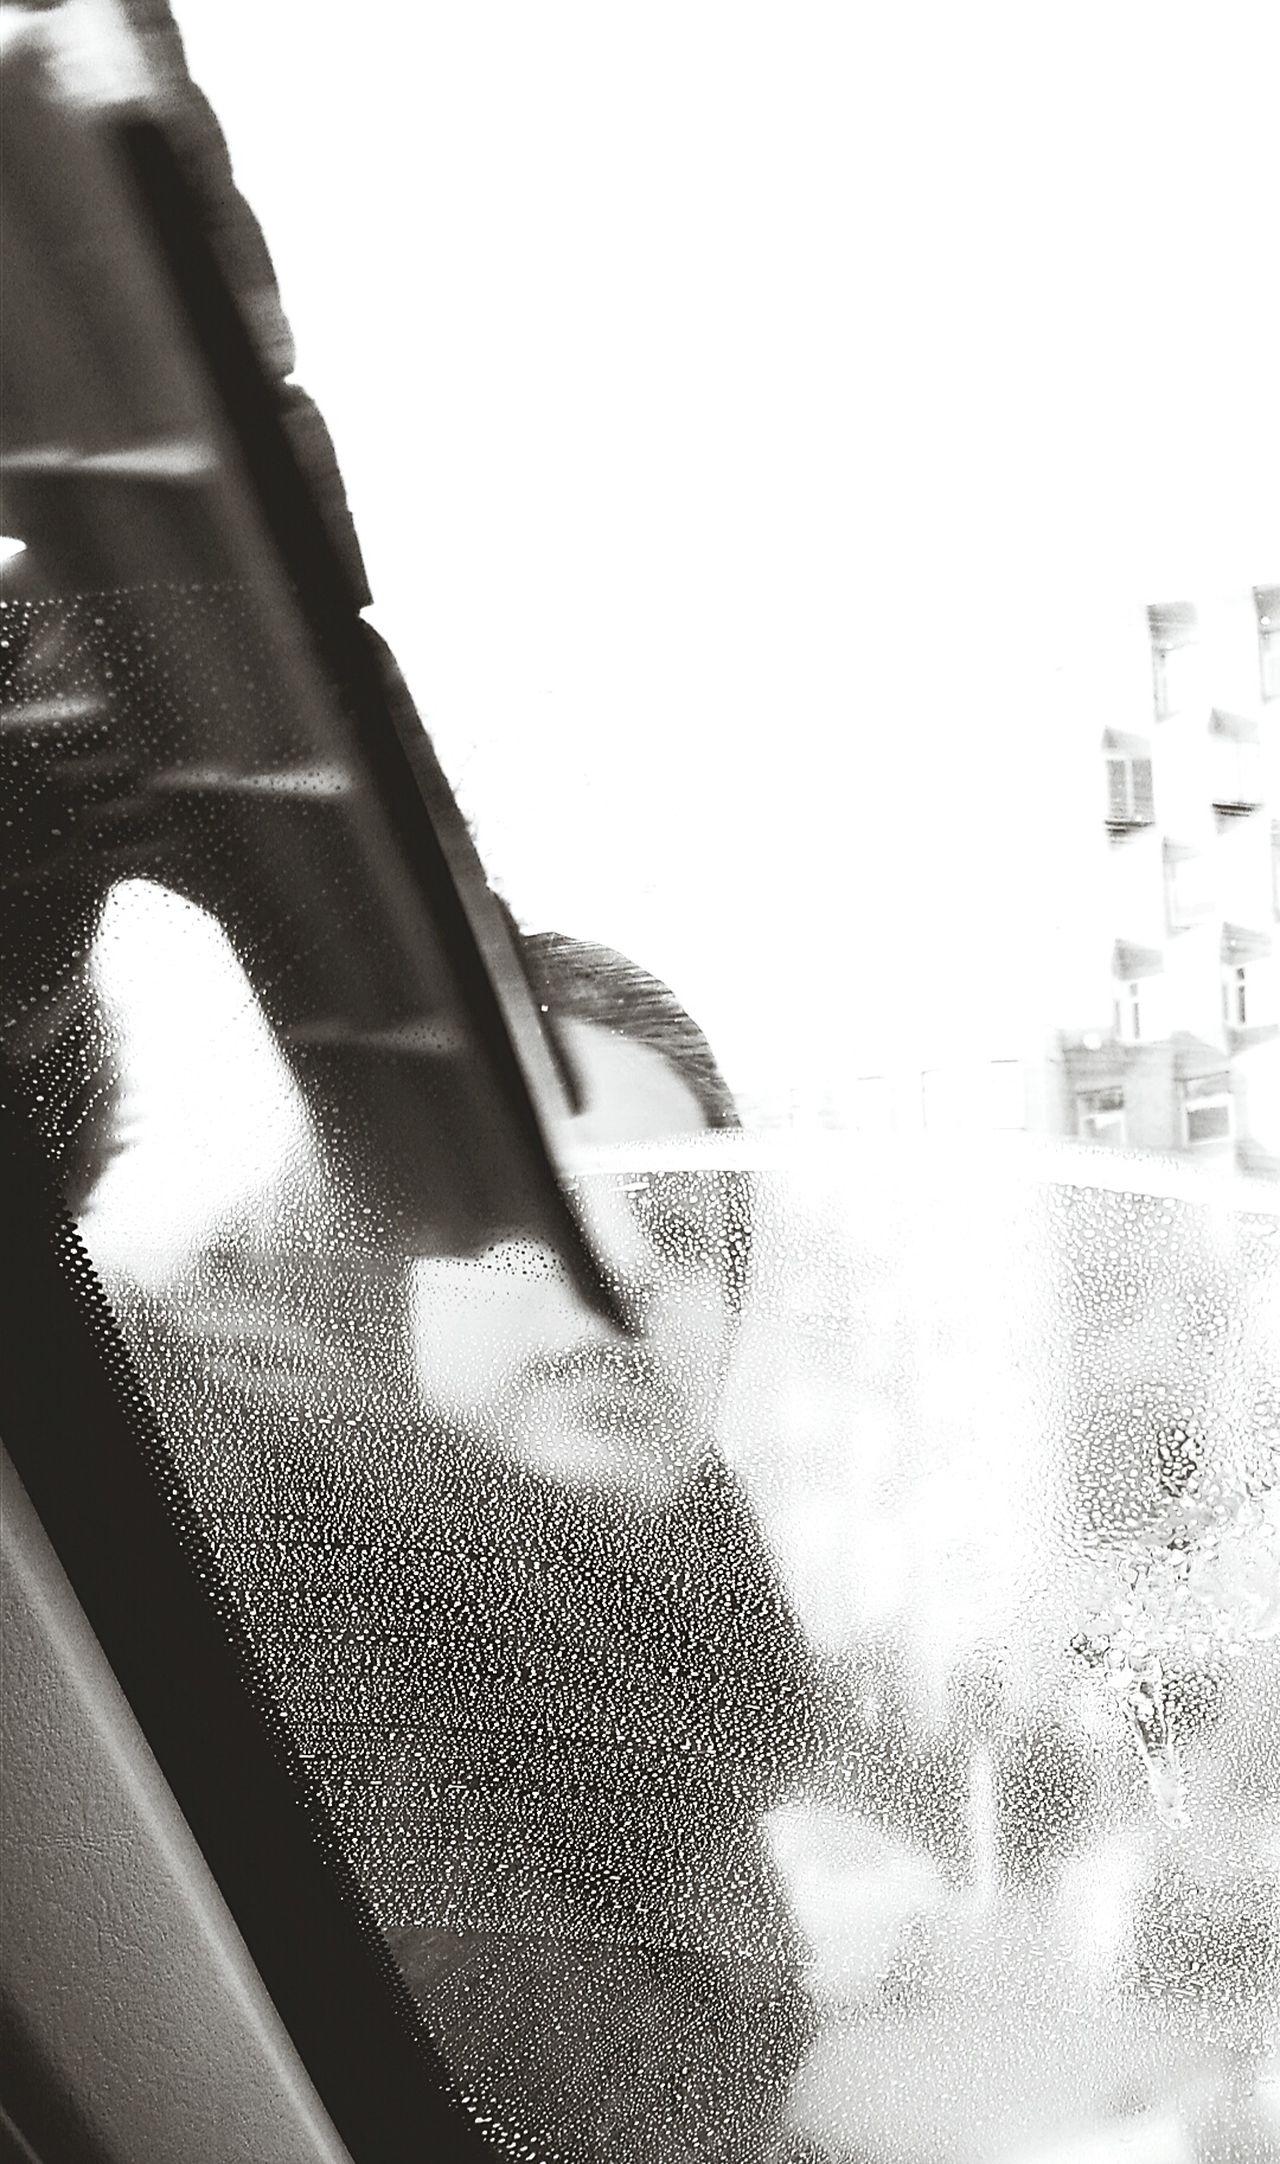 Window Transportation Car Wet Close-up Car Interior One Person Street Children Children Workers Children Working Children Photography Children Playing Poor Kids Poor Children Poor People  Real People Blackandwhite Black And White Photography One Woman Only Black And White Black&white Black And White Collection  Monochrome Black And White Collection  Black And White Collection